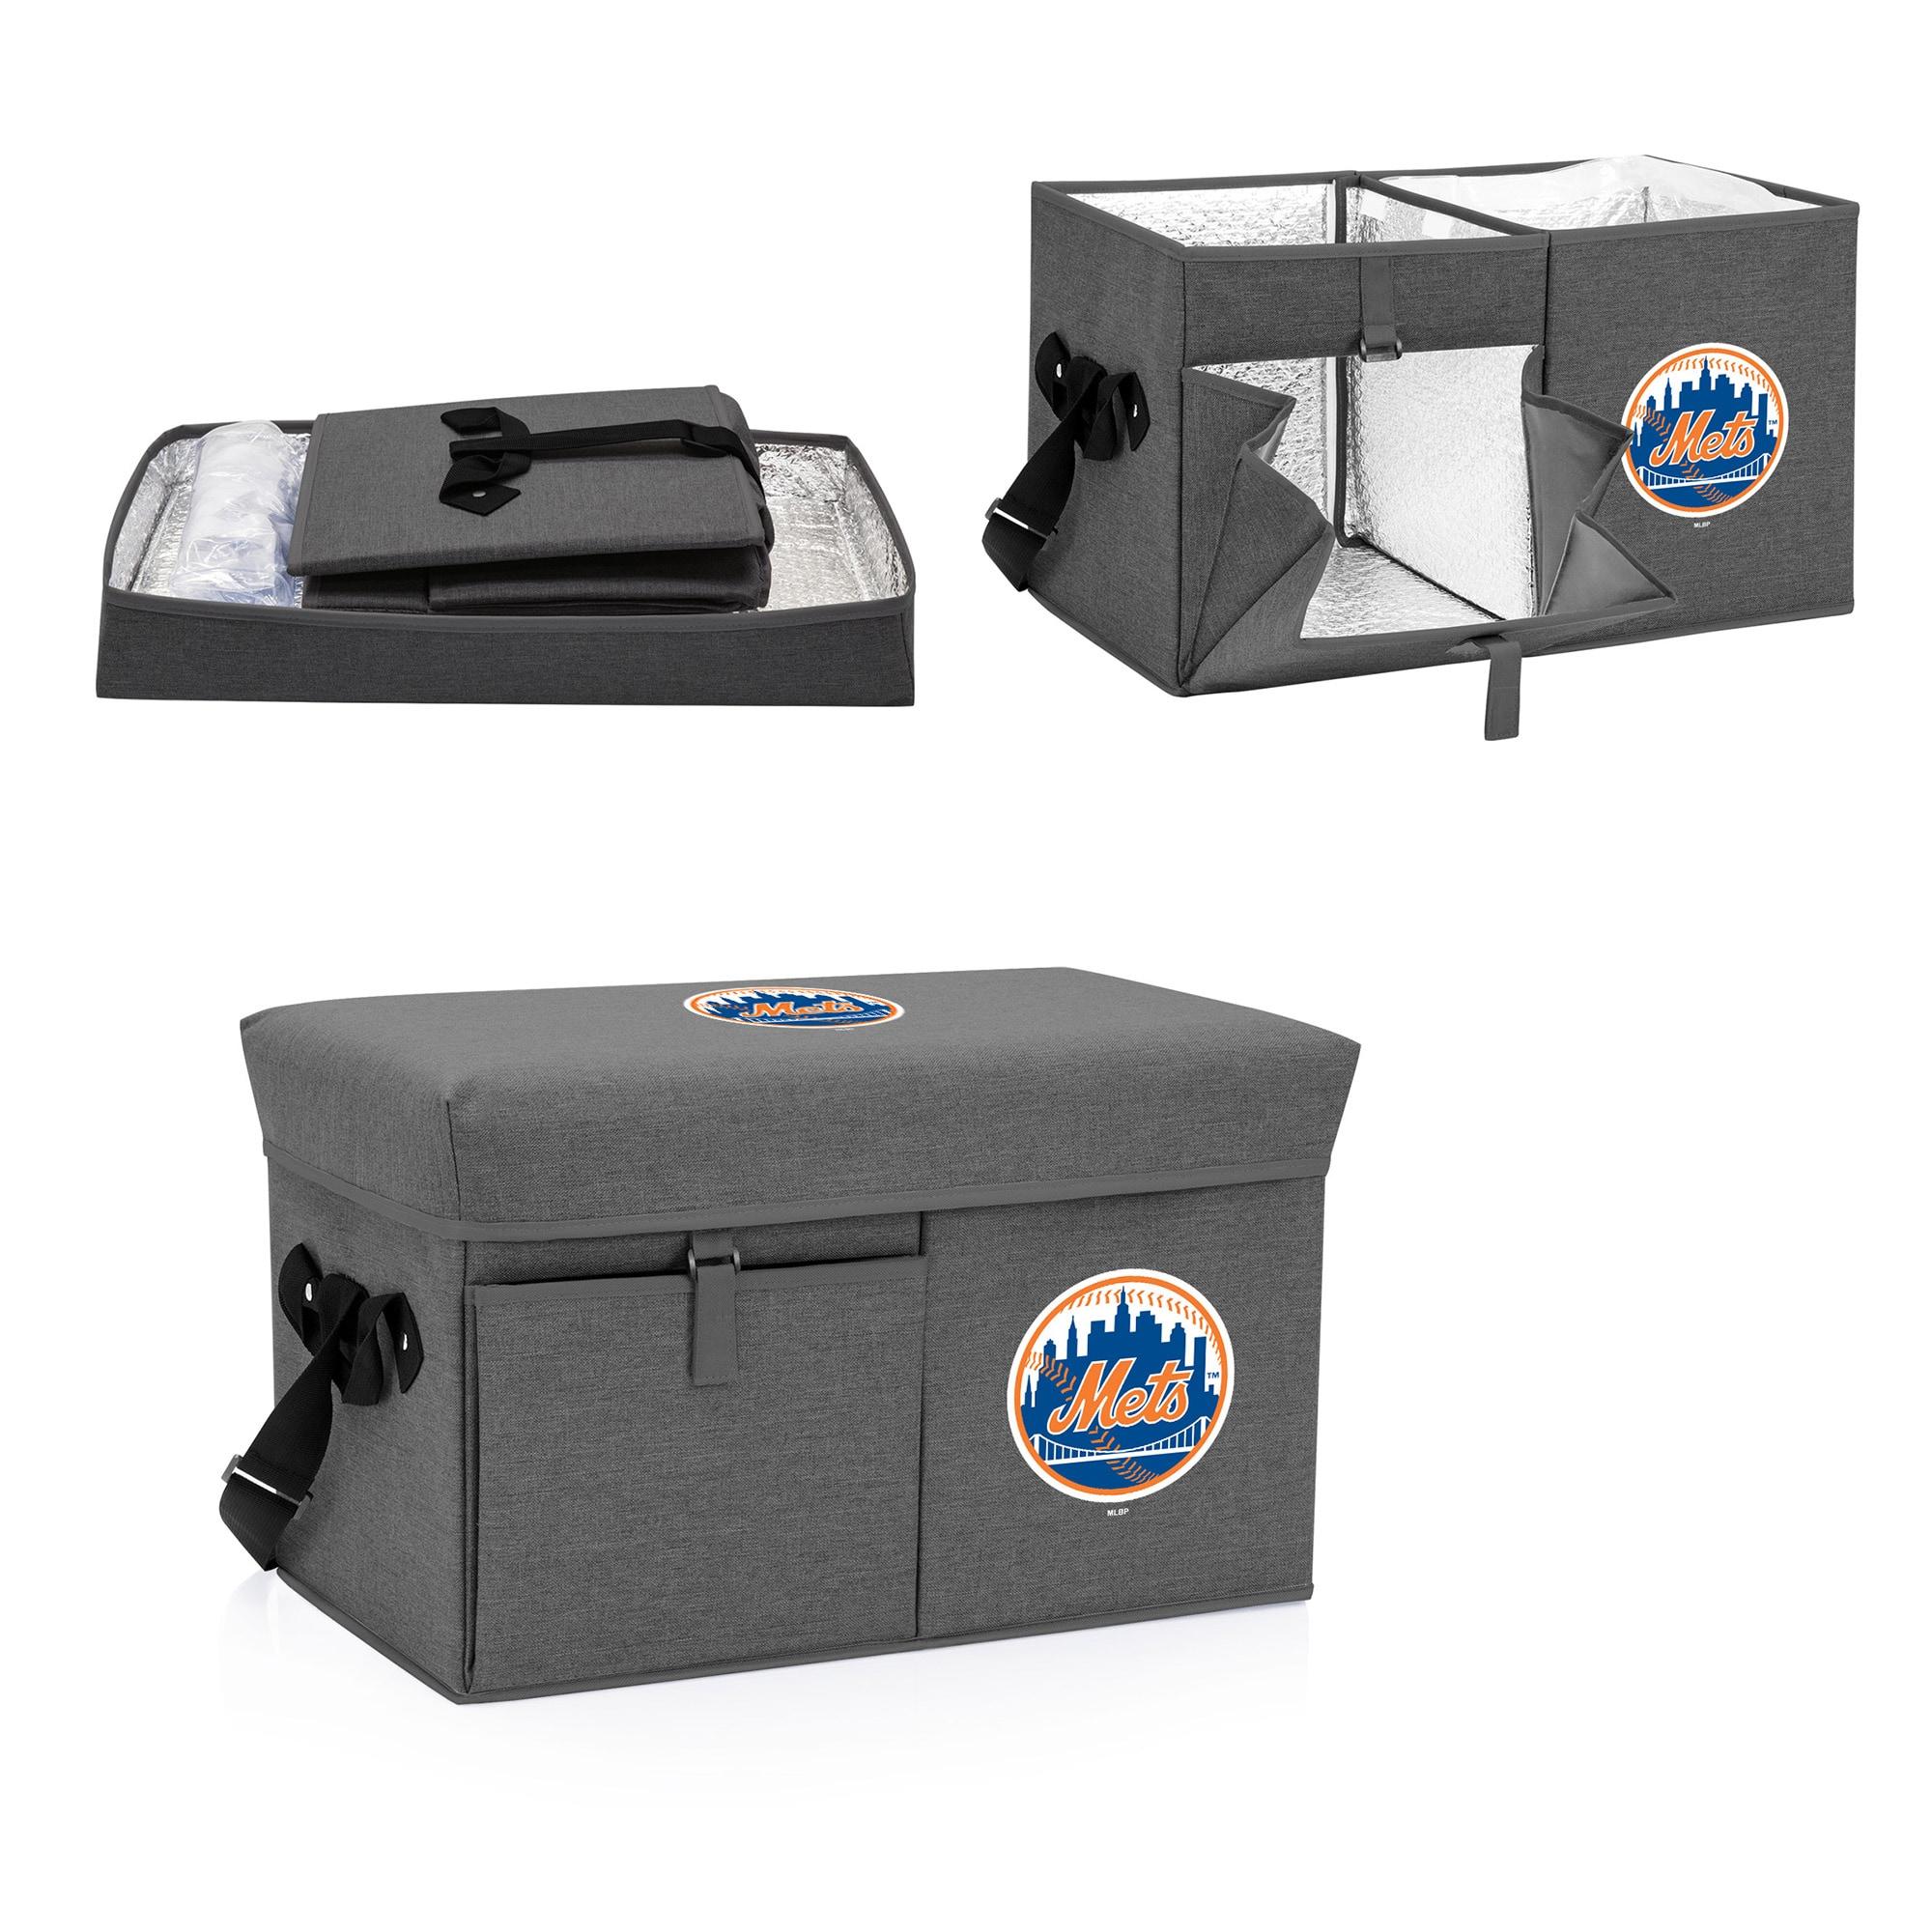 New York Mets Ottoman Cooler & Seat - Gray